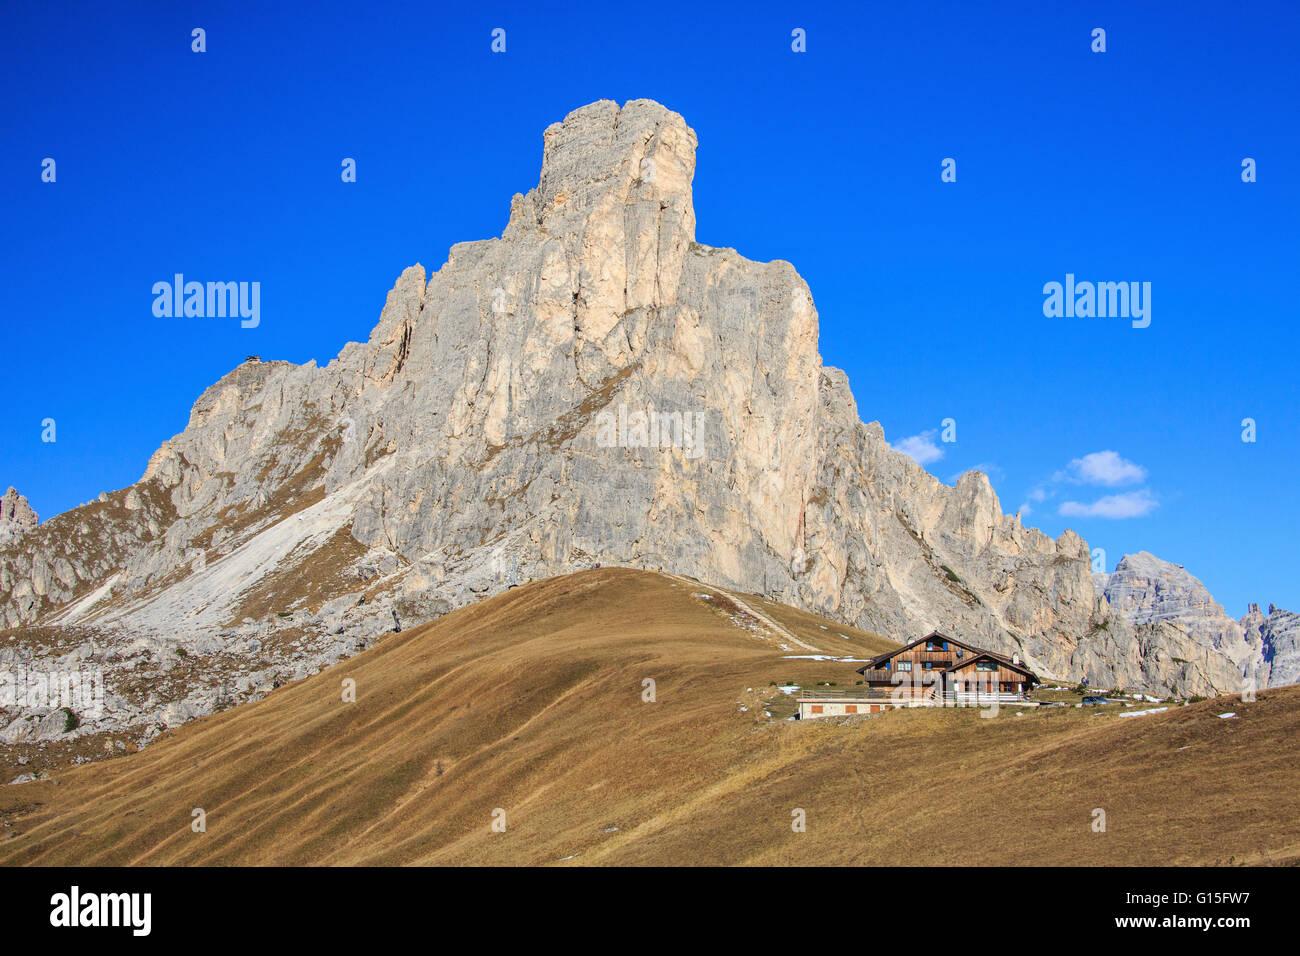 Autumnal view of the high rocky peak of Ra Gusela from Falzarego Pass, Dolomites of Belluno, Trentino-Alto Adige, - Stock Image